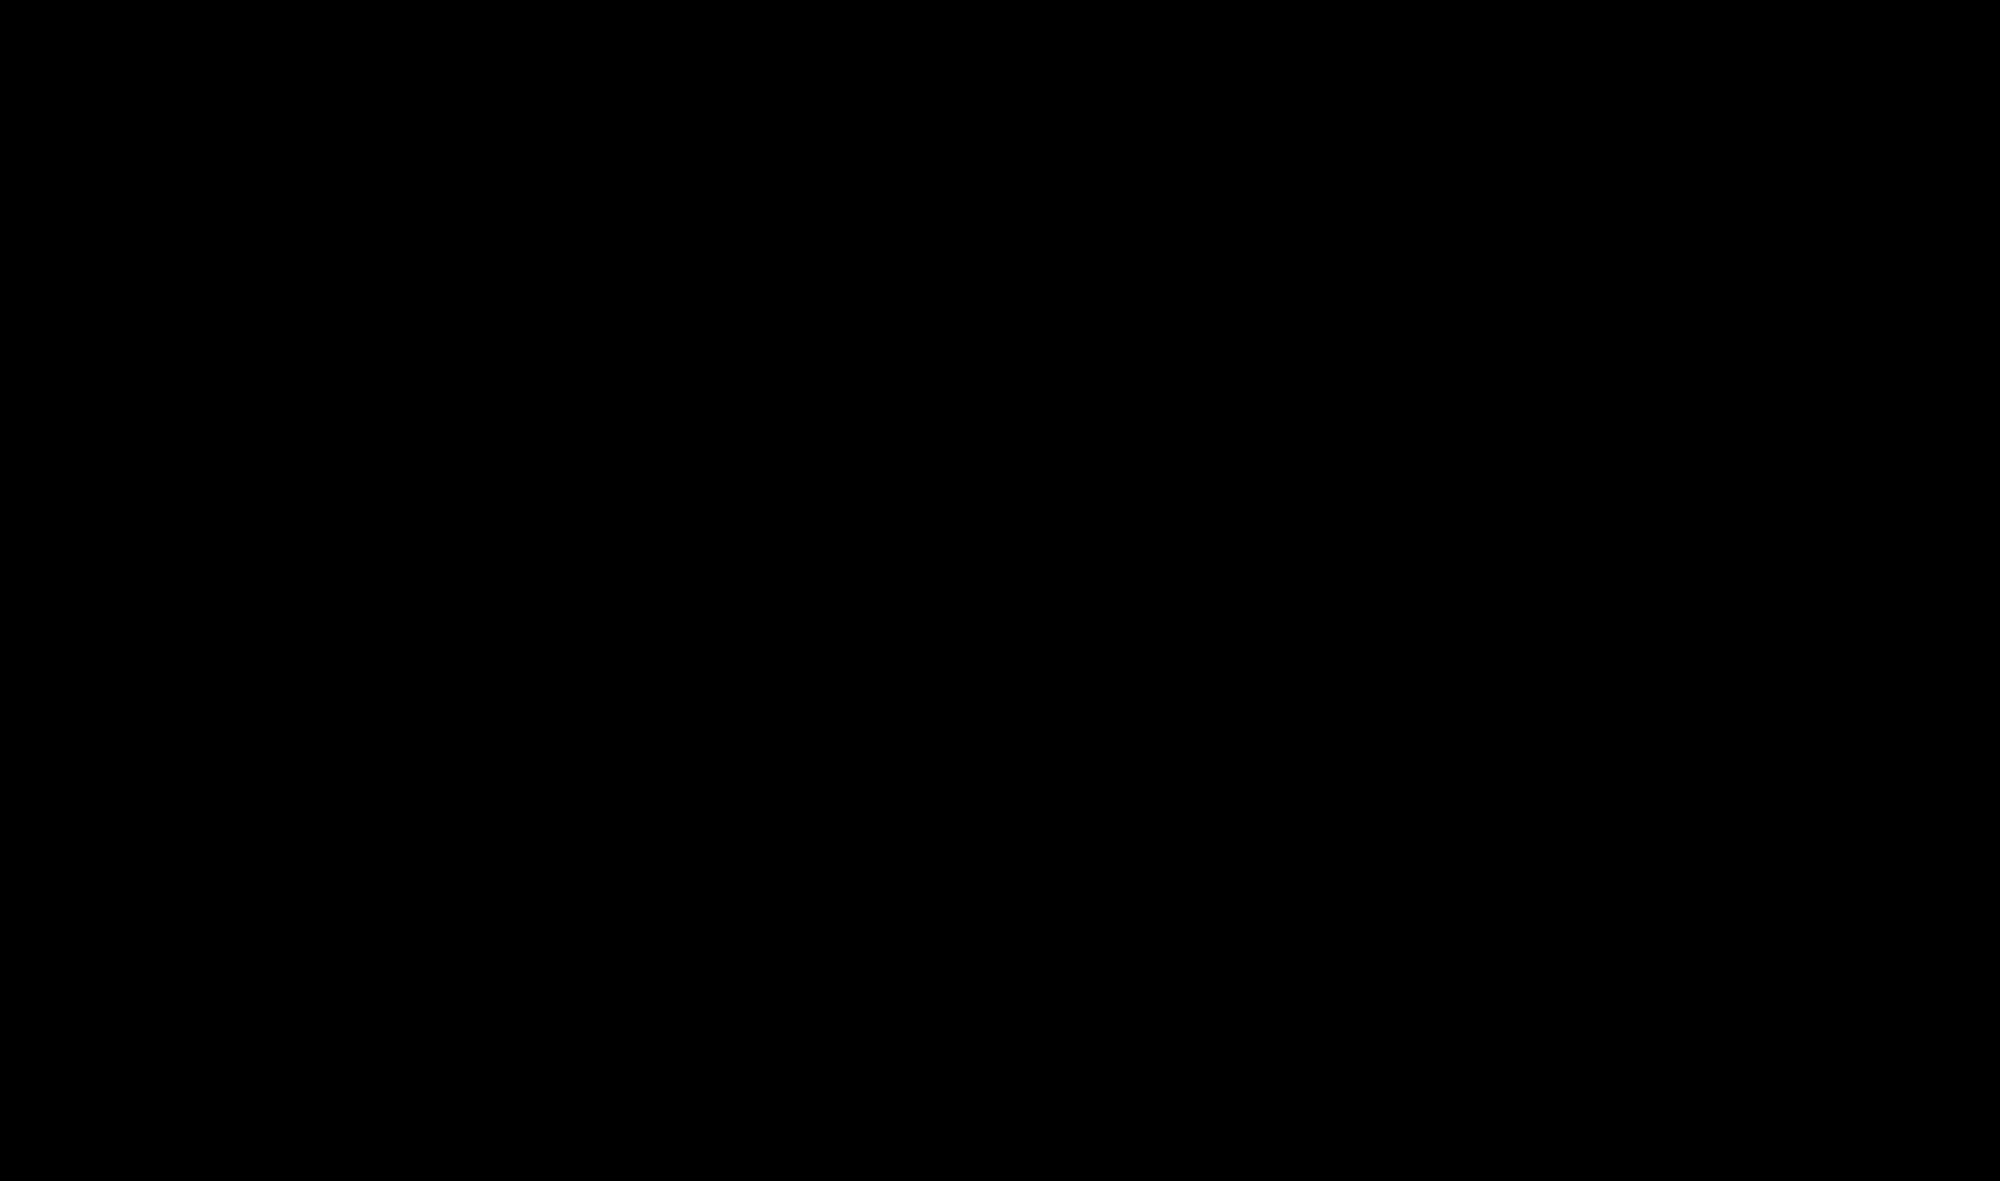 Markunit icon